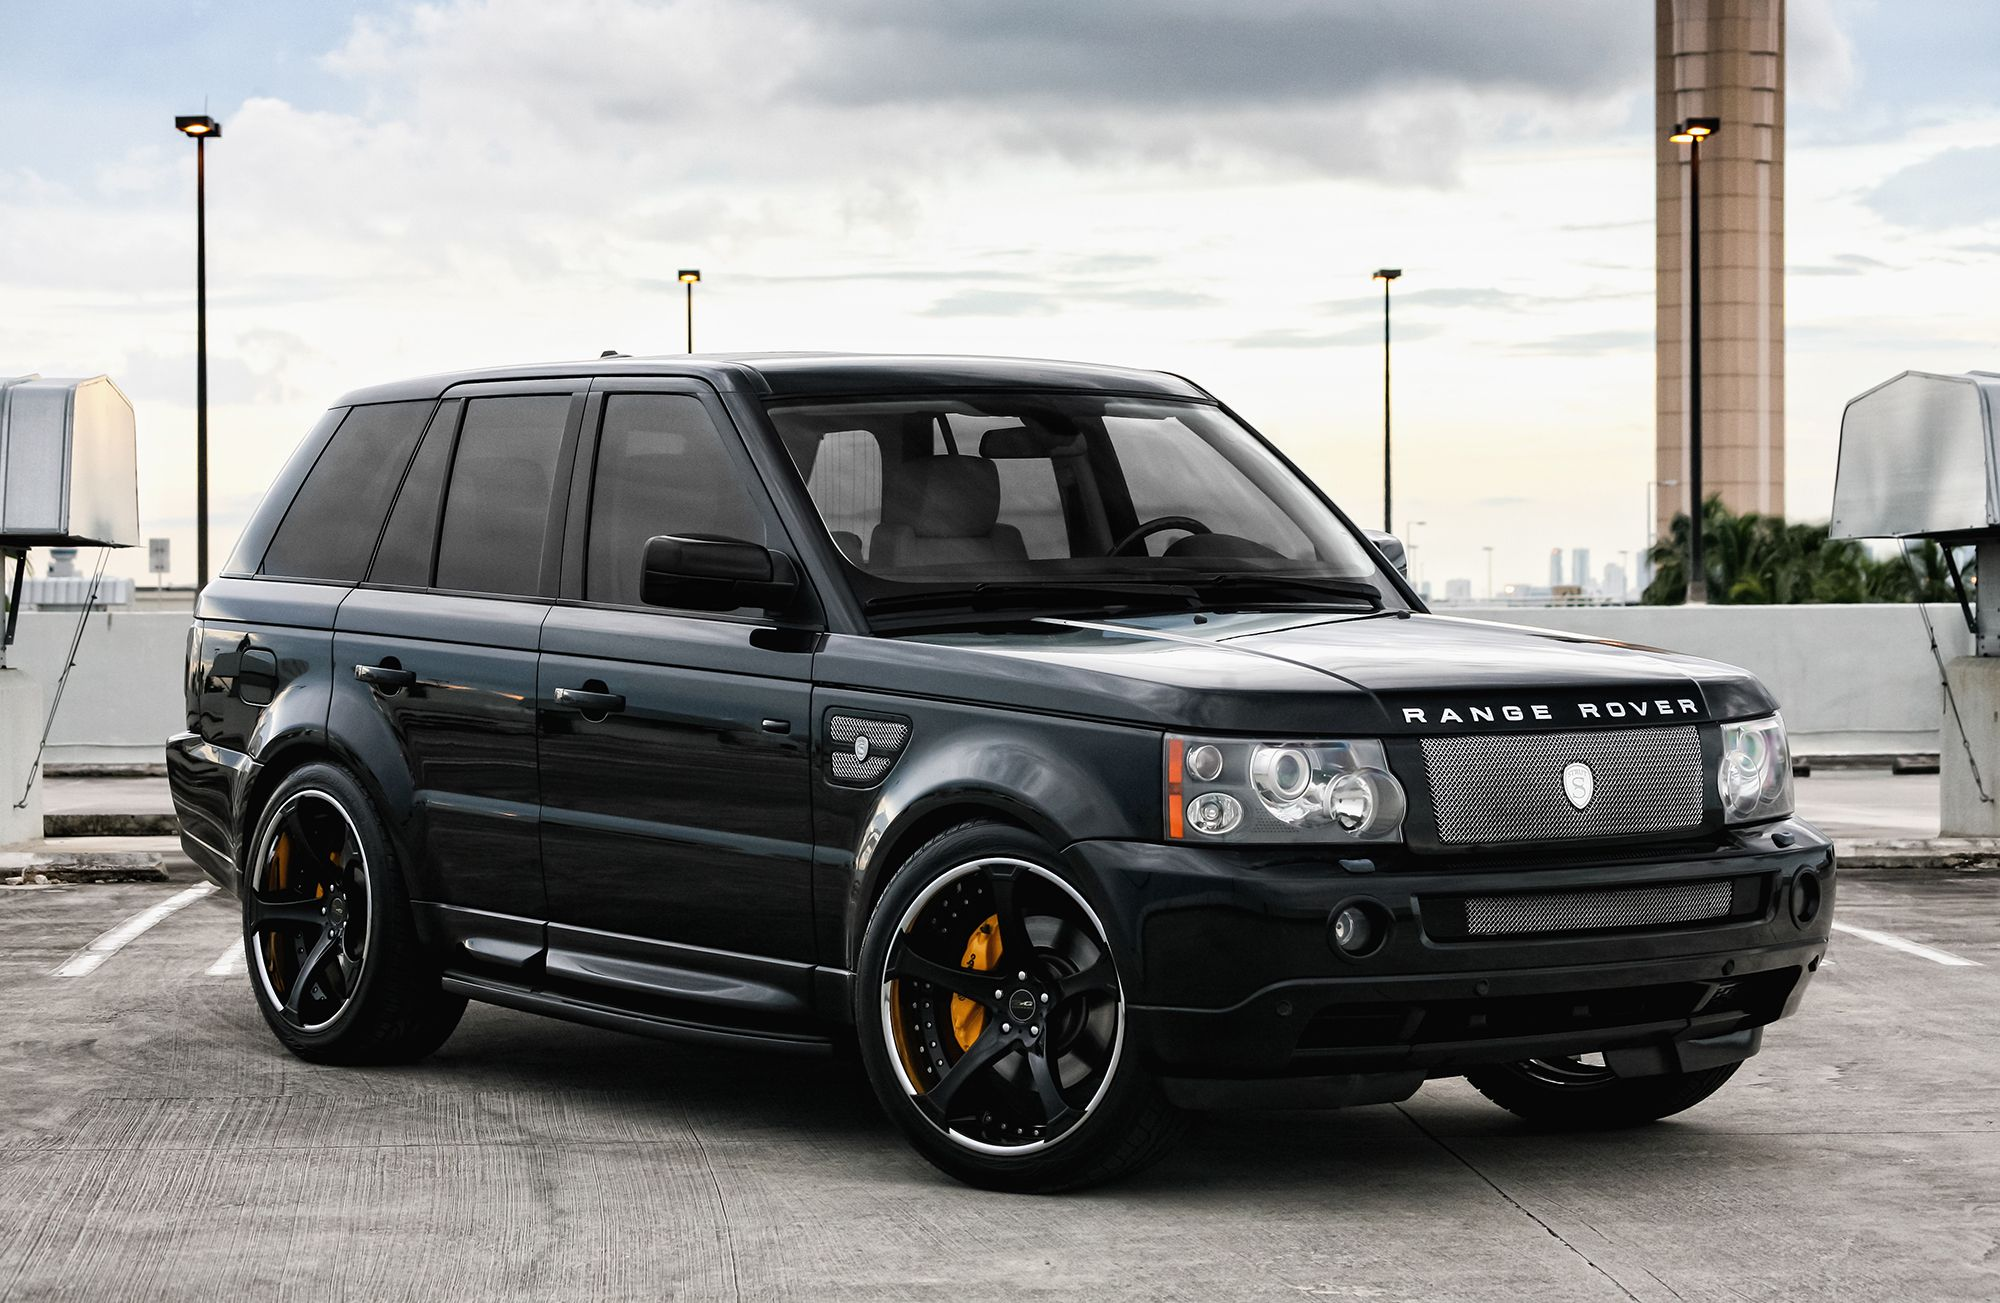 Customized Range Rover Sport Exclusive Motoring Miami Fl Range Rover Sport Range Rover Landrover Range Rover